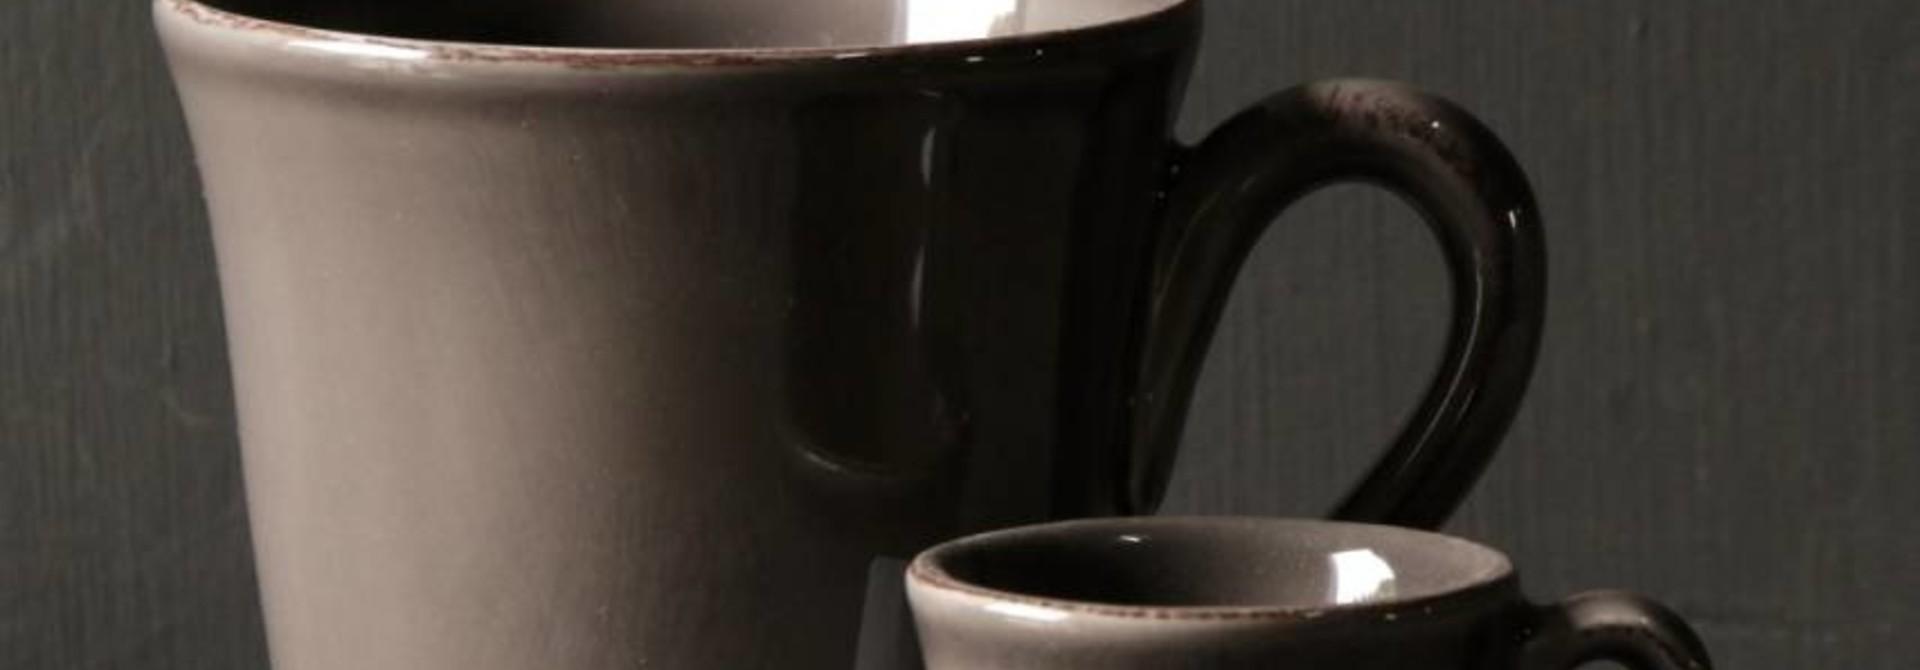 Côté Table Espresso kopje Constance  pepper